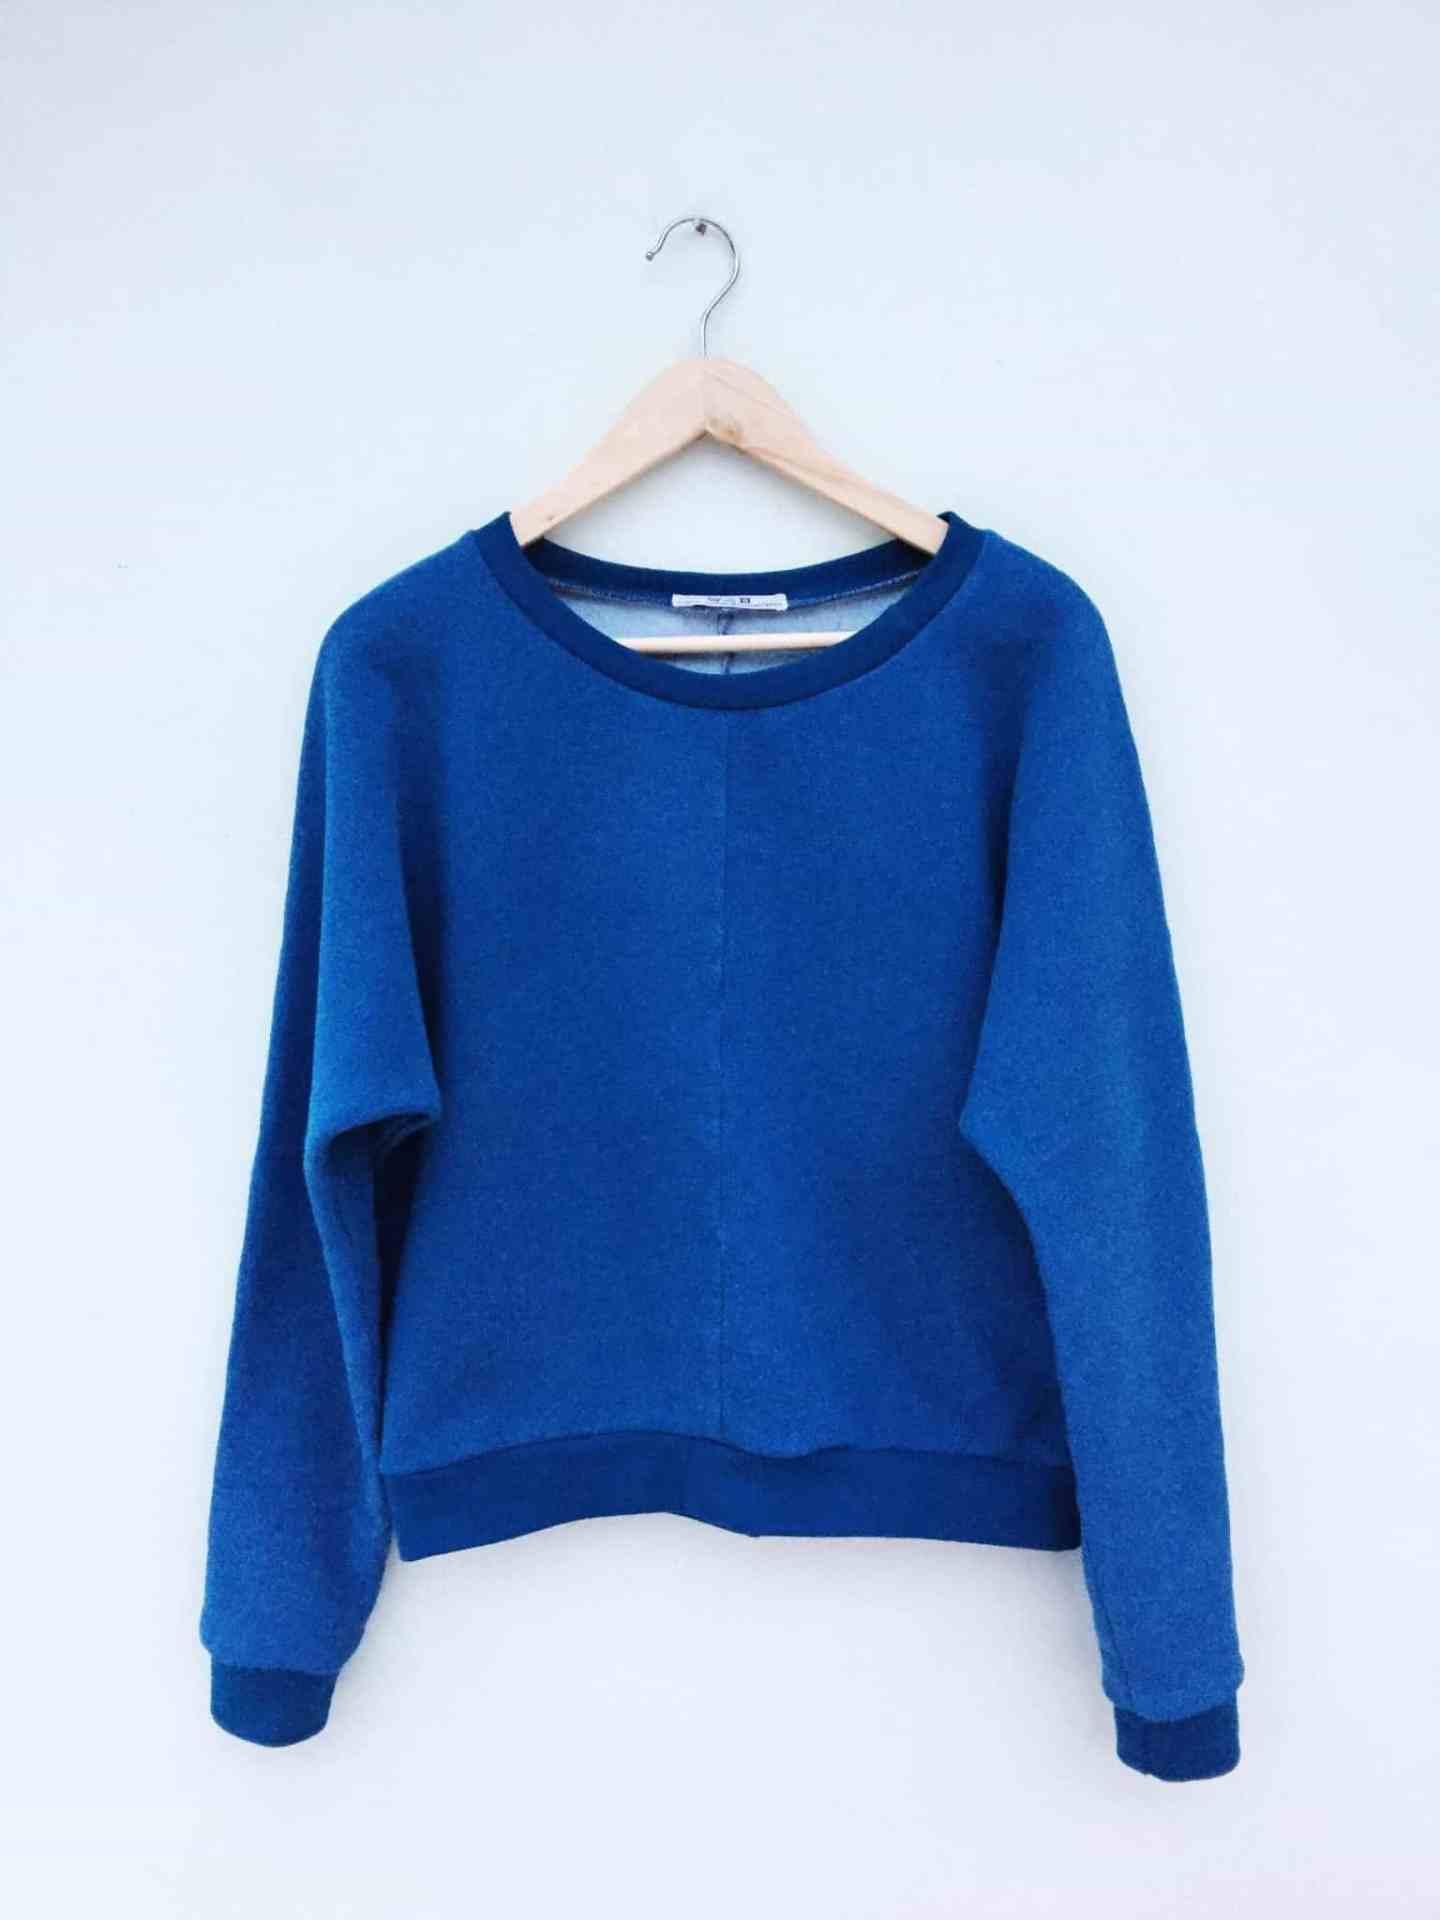 With Narrative Blue Organic Sweatshirt.